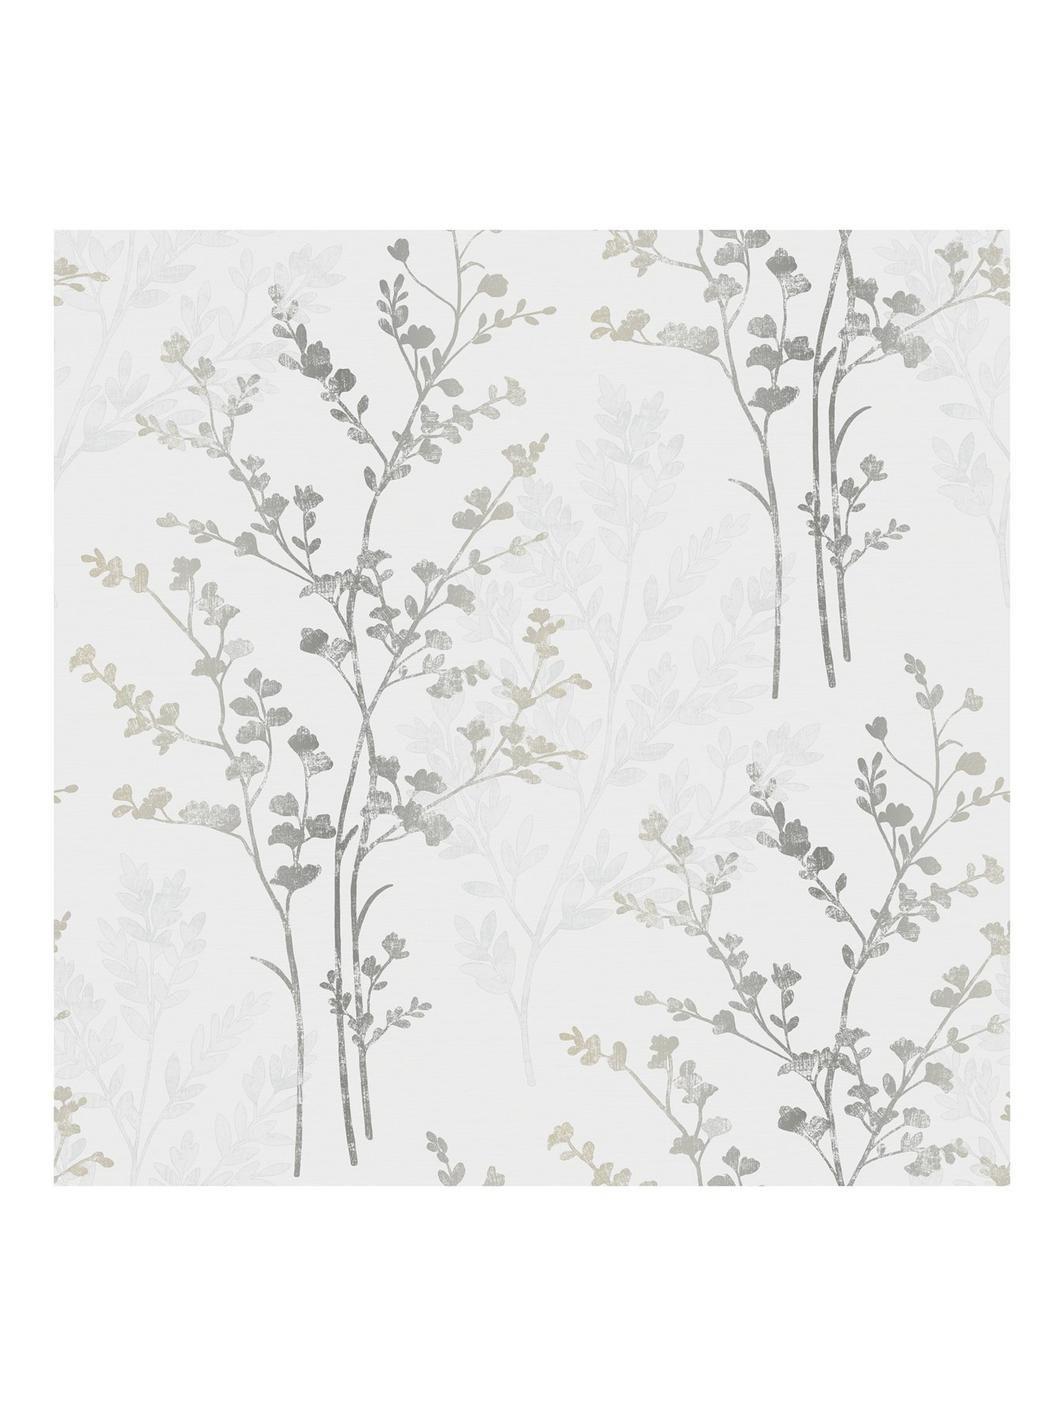 Home diy wallpaper illustration arthouse imagine fern plum motif vinyl - Fern Motif Silver Wallpaper Search Results For Arthouse Imagine